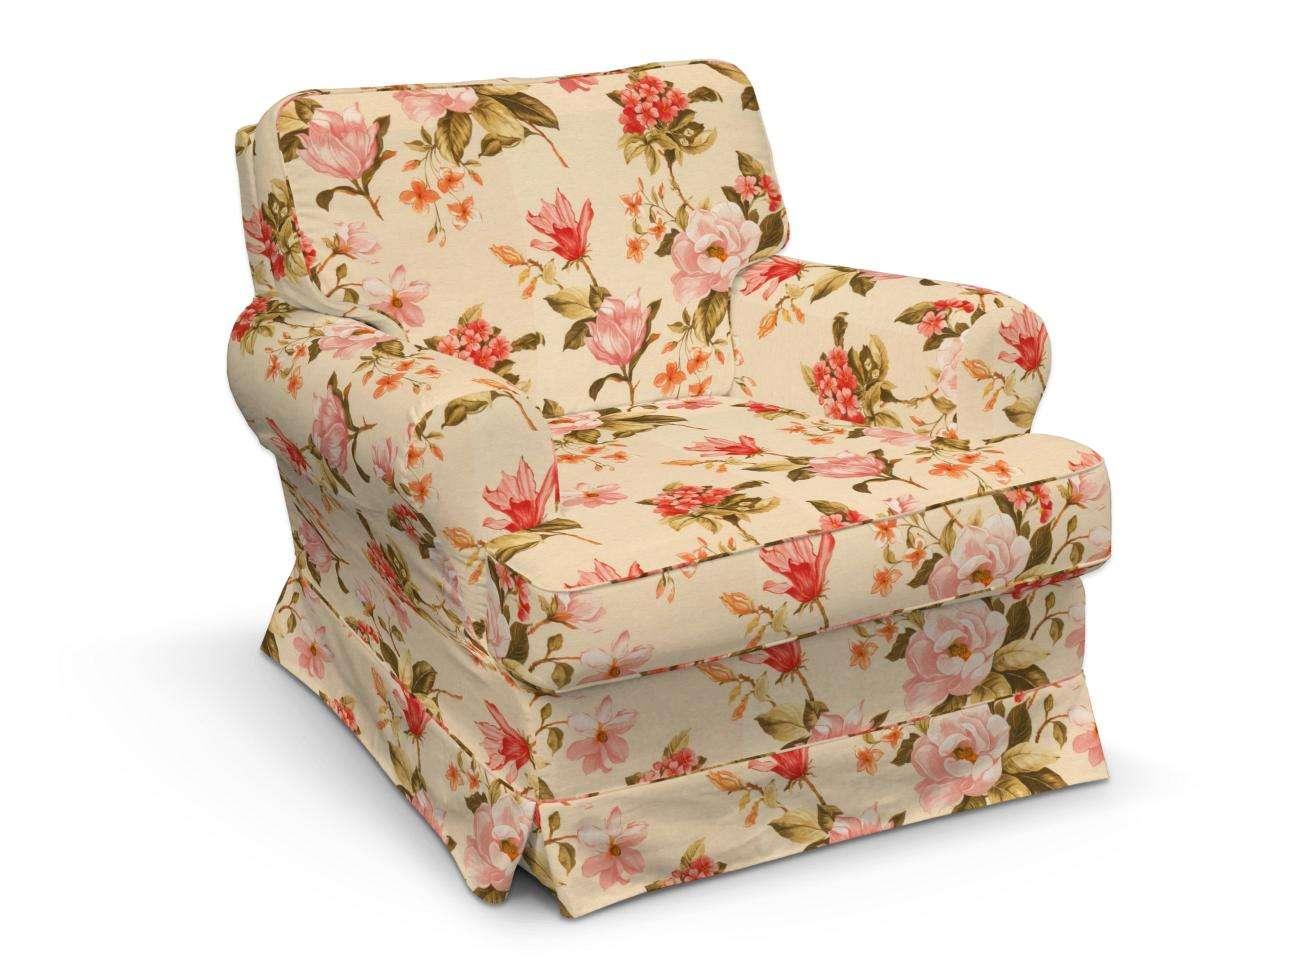 Barkaby Sesselbezug von der Kollektion Londres, Stoff: 123-05